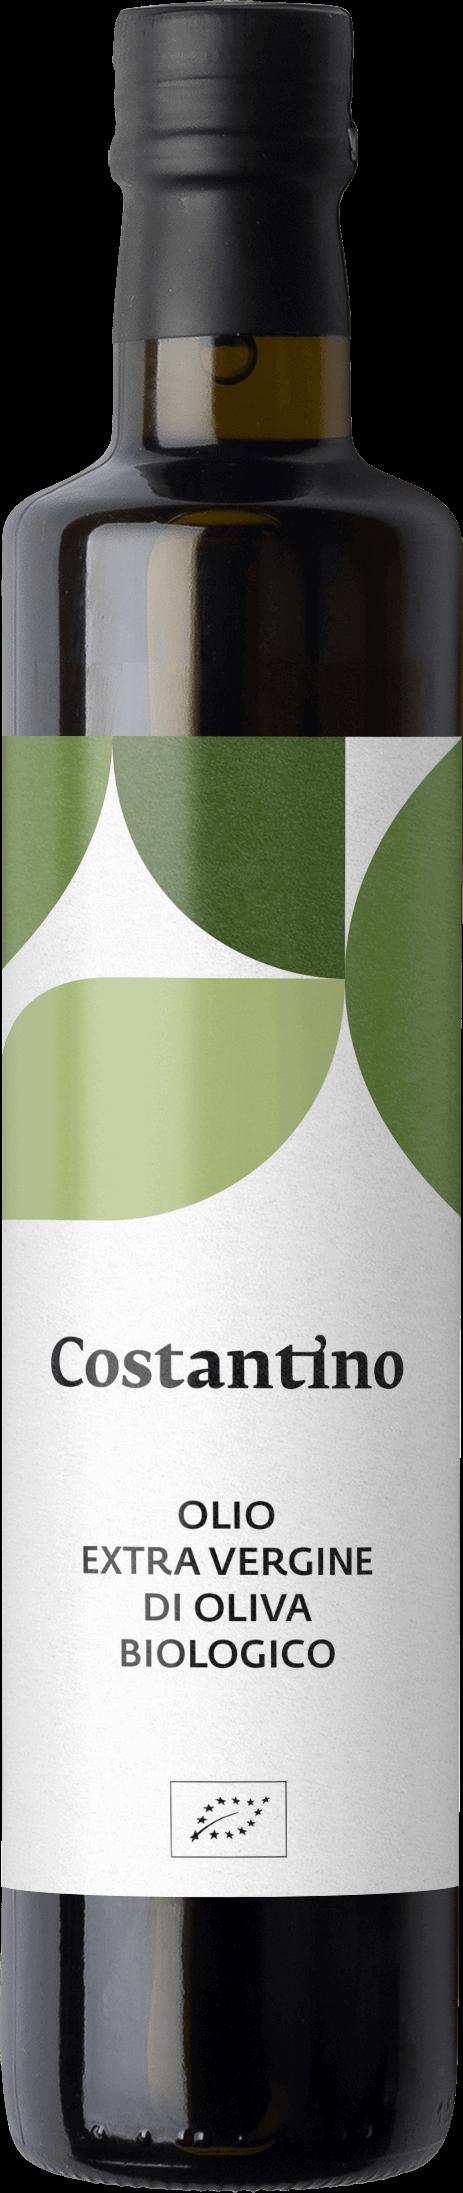 Costantino - Olio Extra Vergine d'Oliva Biologico - bottiglia 50cl